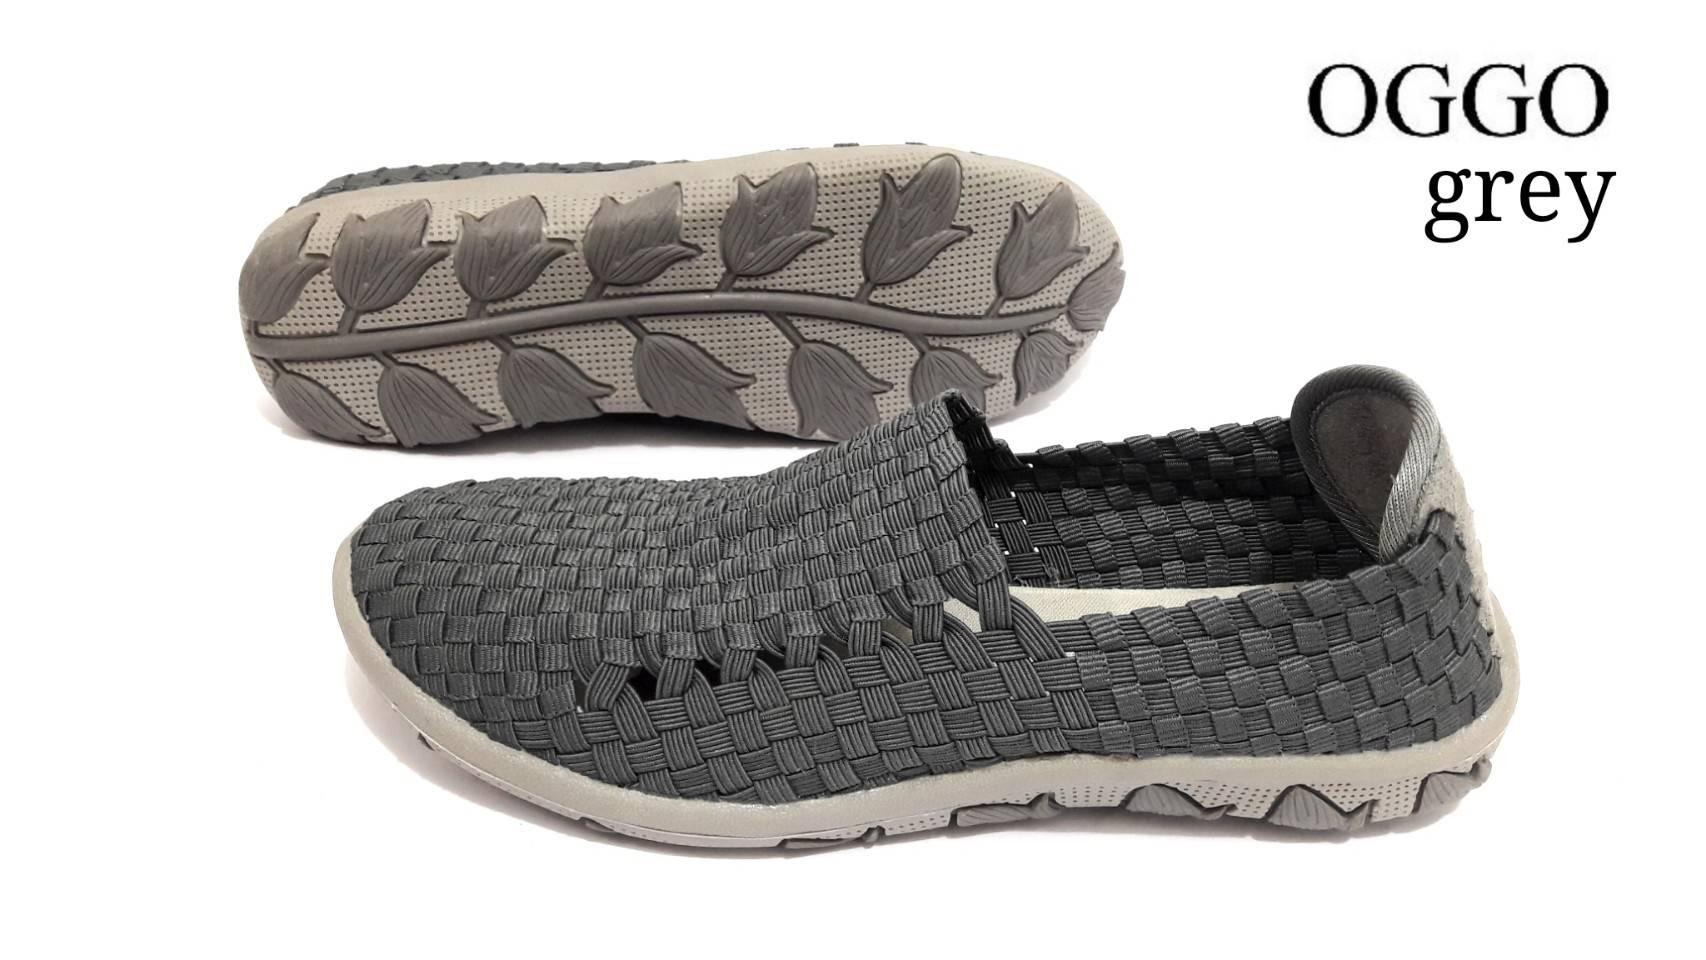 Sepatu Slip On Santai Anyaman Wanita Oggo   Sepatu SLop   Sepatu Rajutan    Sepatu Rajutan 84c34f1f33